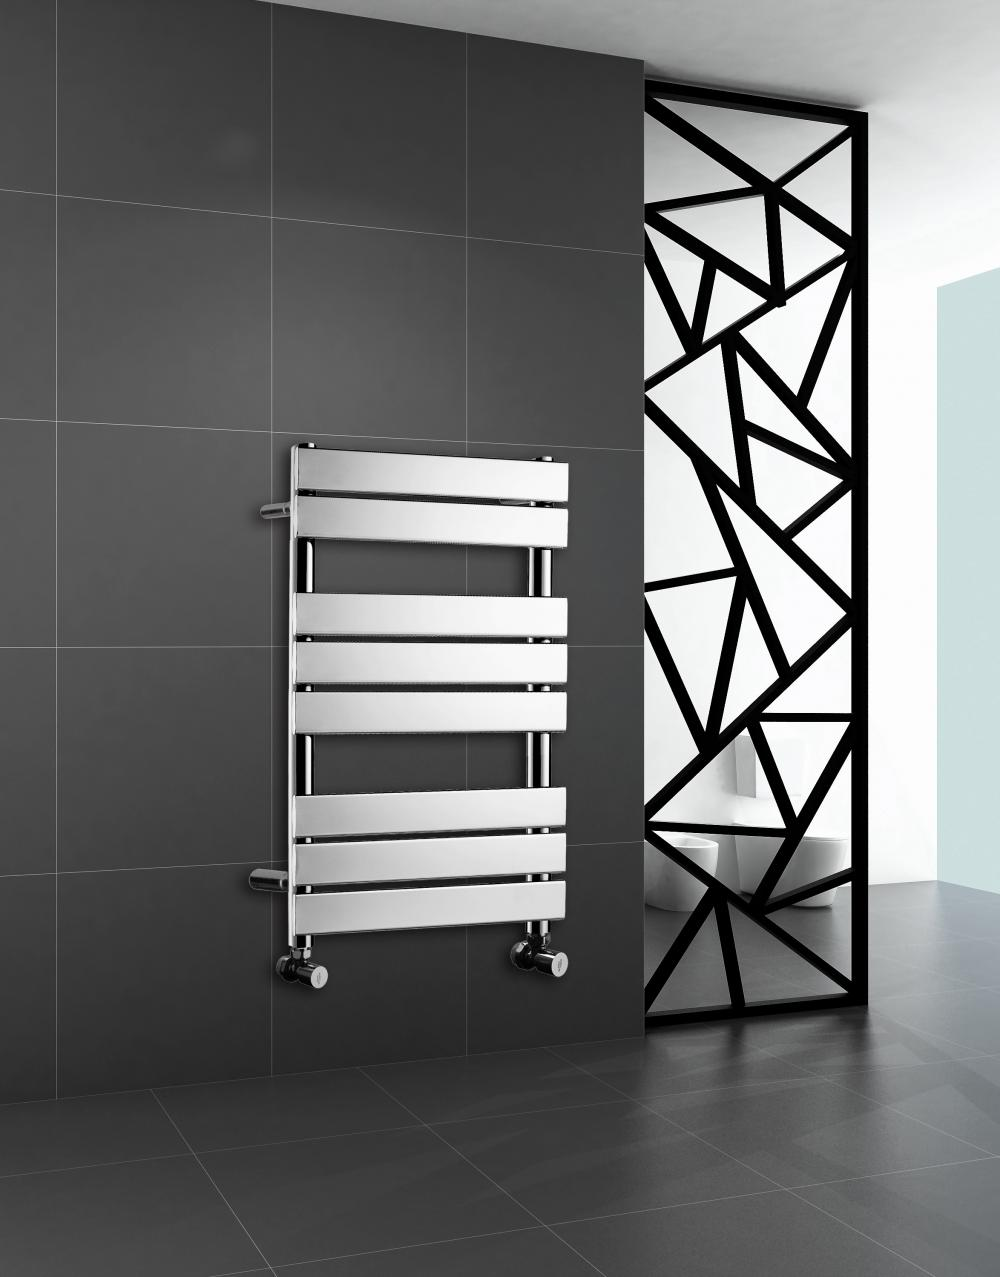 Towel rails for bathroom - Luxury Designer Chrome Flat Panel Towel Rail Bathroom